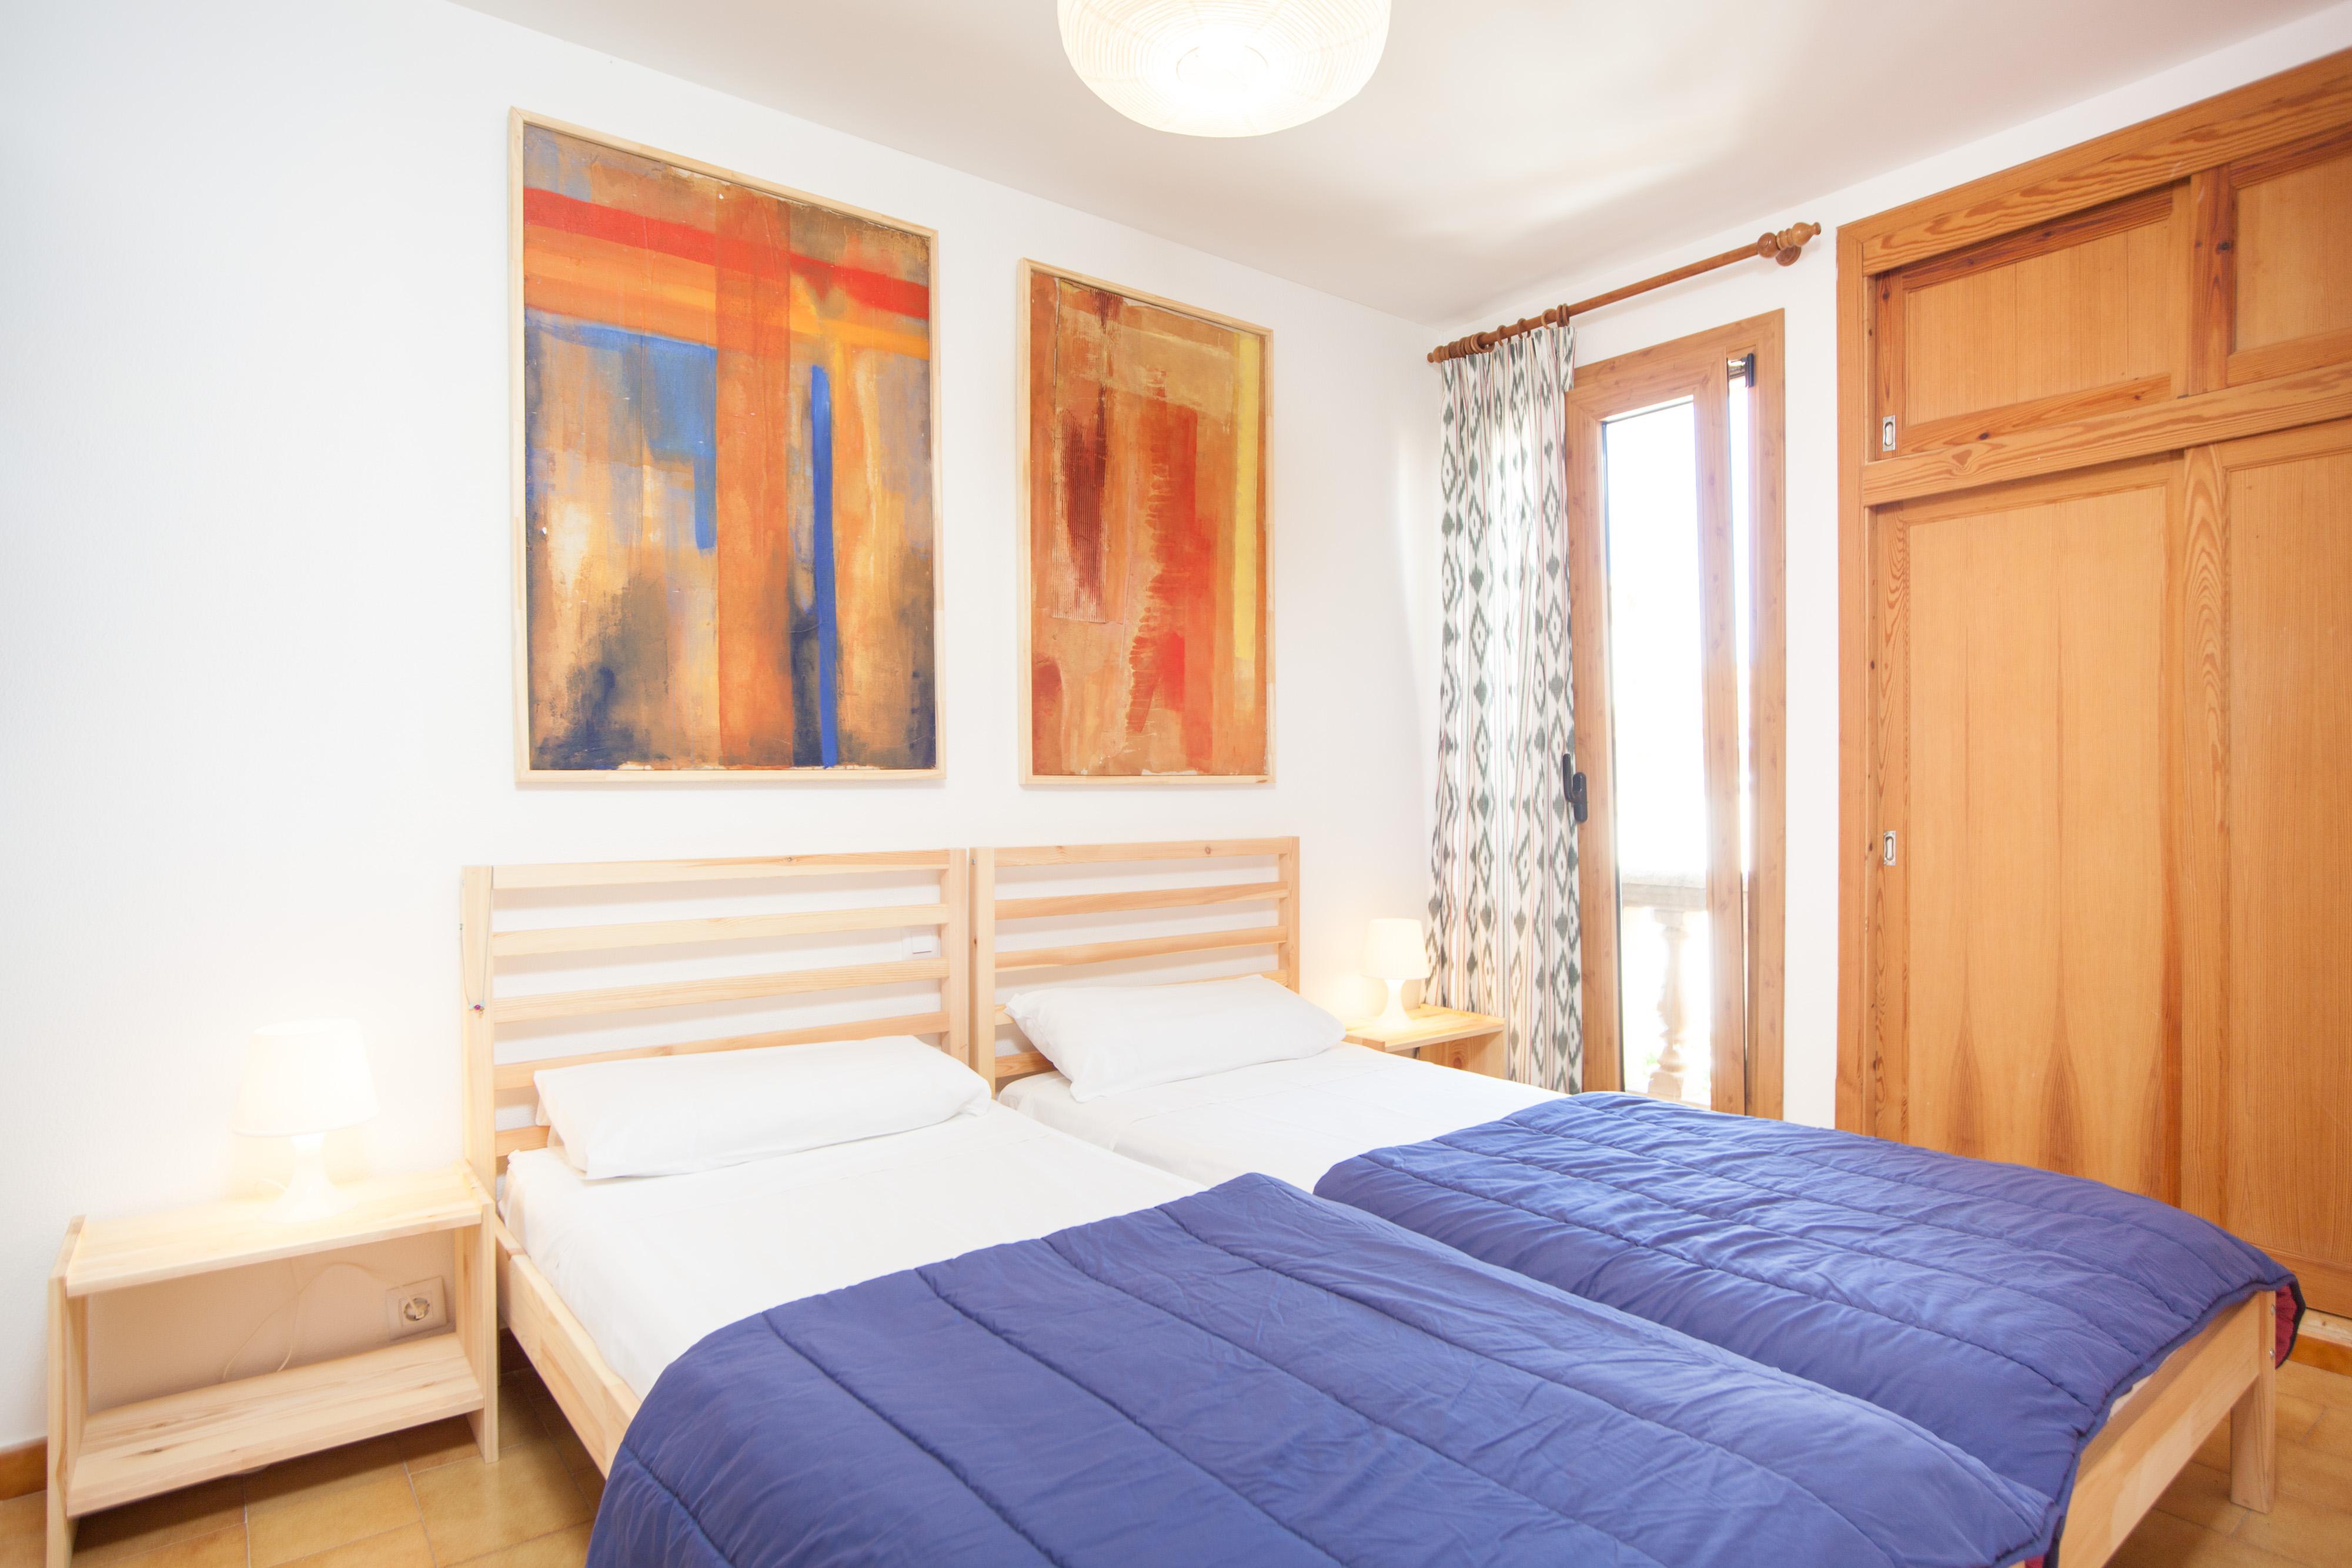 Ferienhaus CAN CUSSÓ SANSÓ (2198042), Colonia de Sant Pere, Mallorca, Balearische Inseln, Spanien, Bild 16